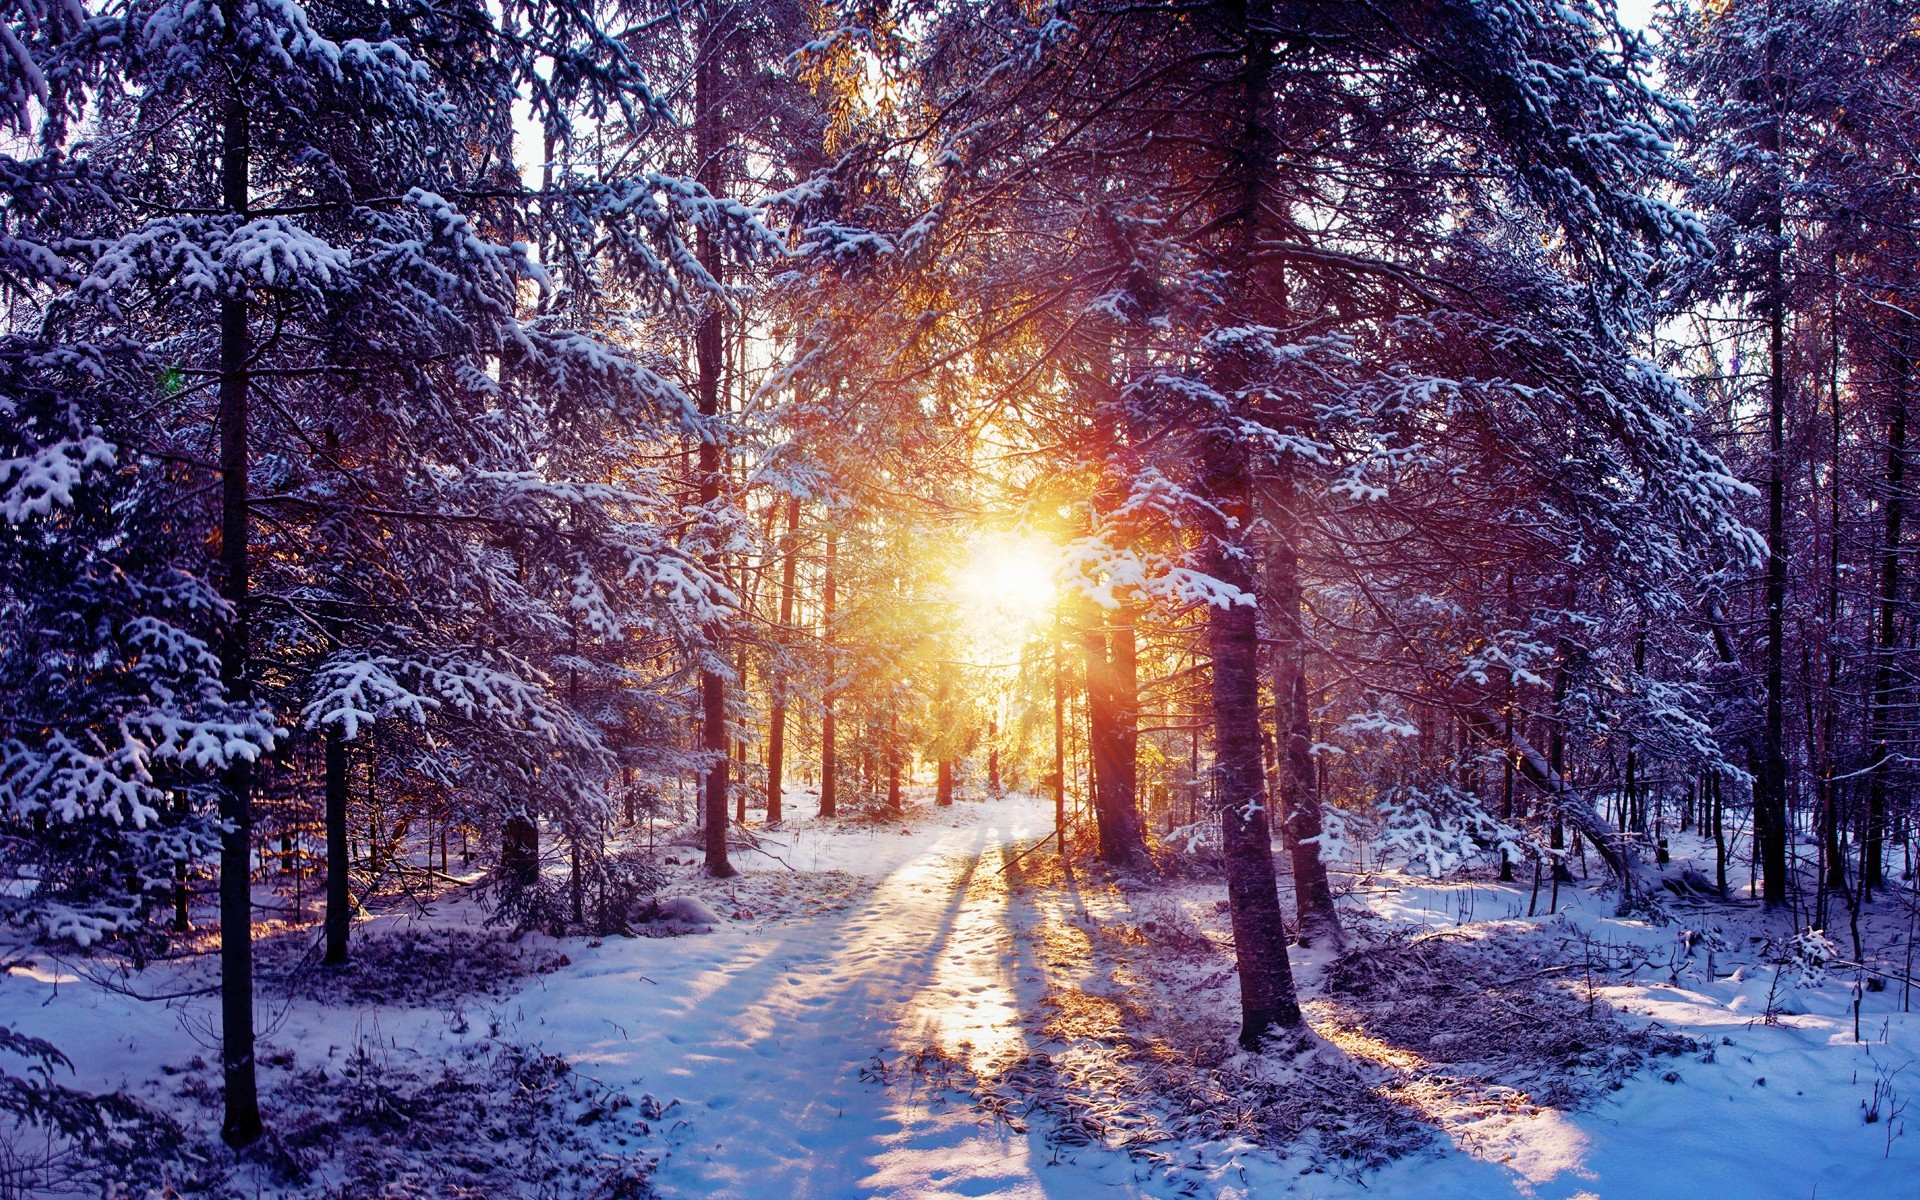 scenic winter beautiful wallpapers - photo #23